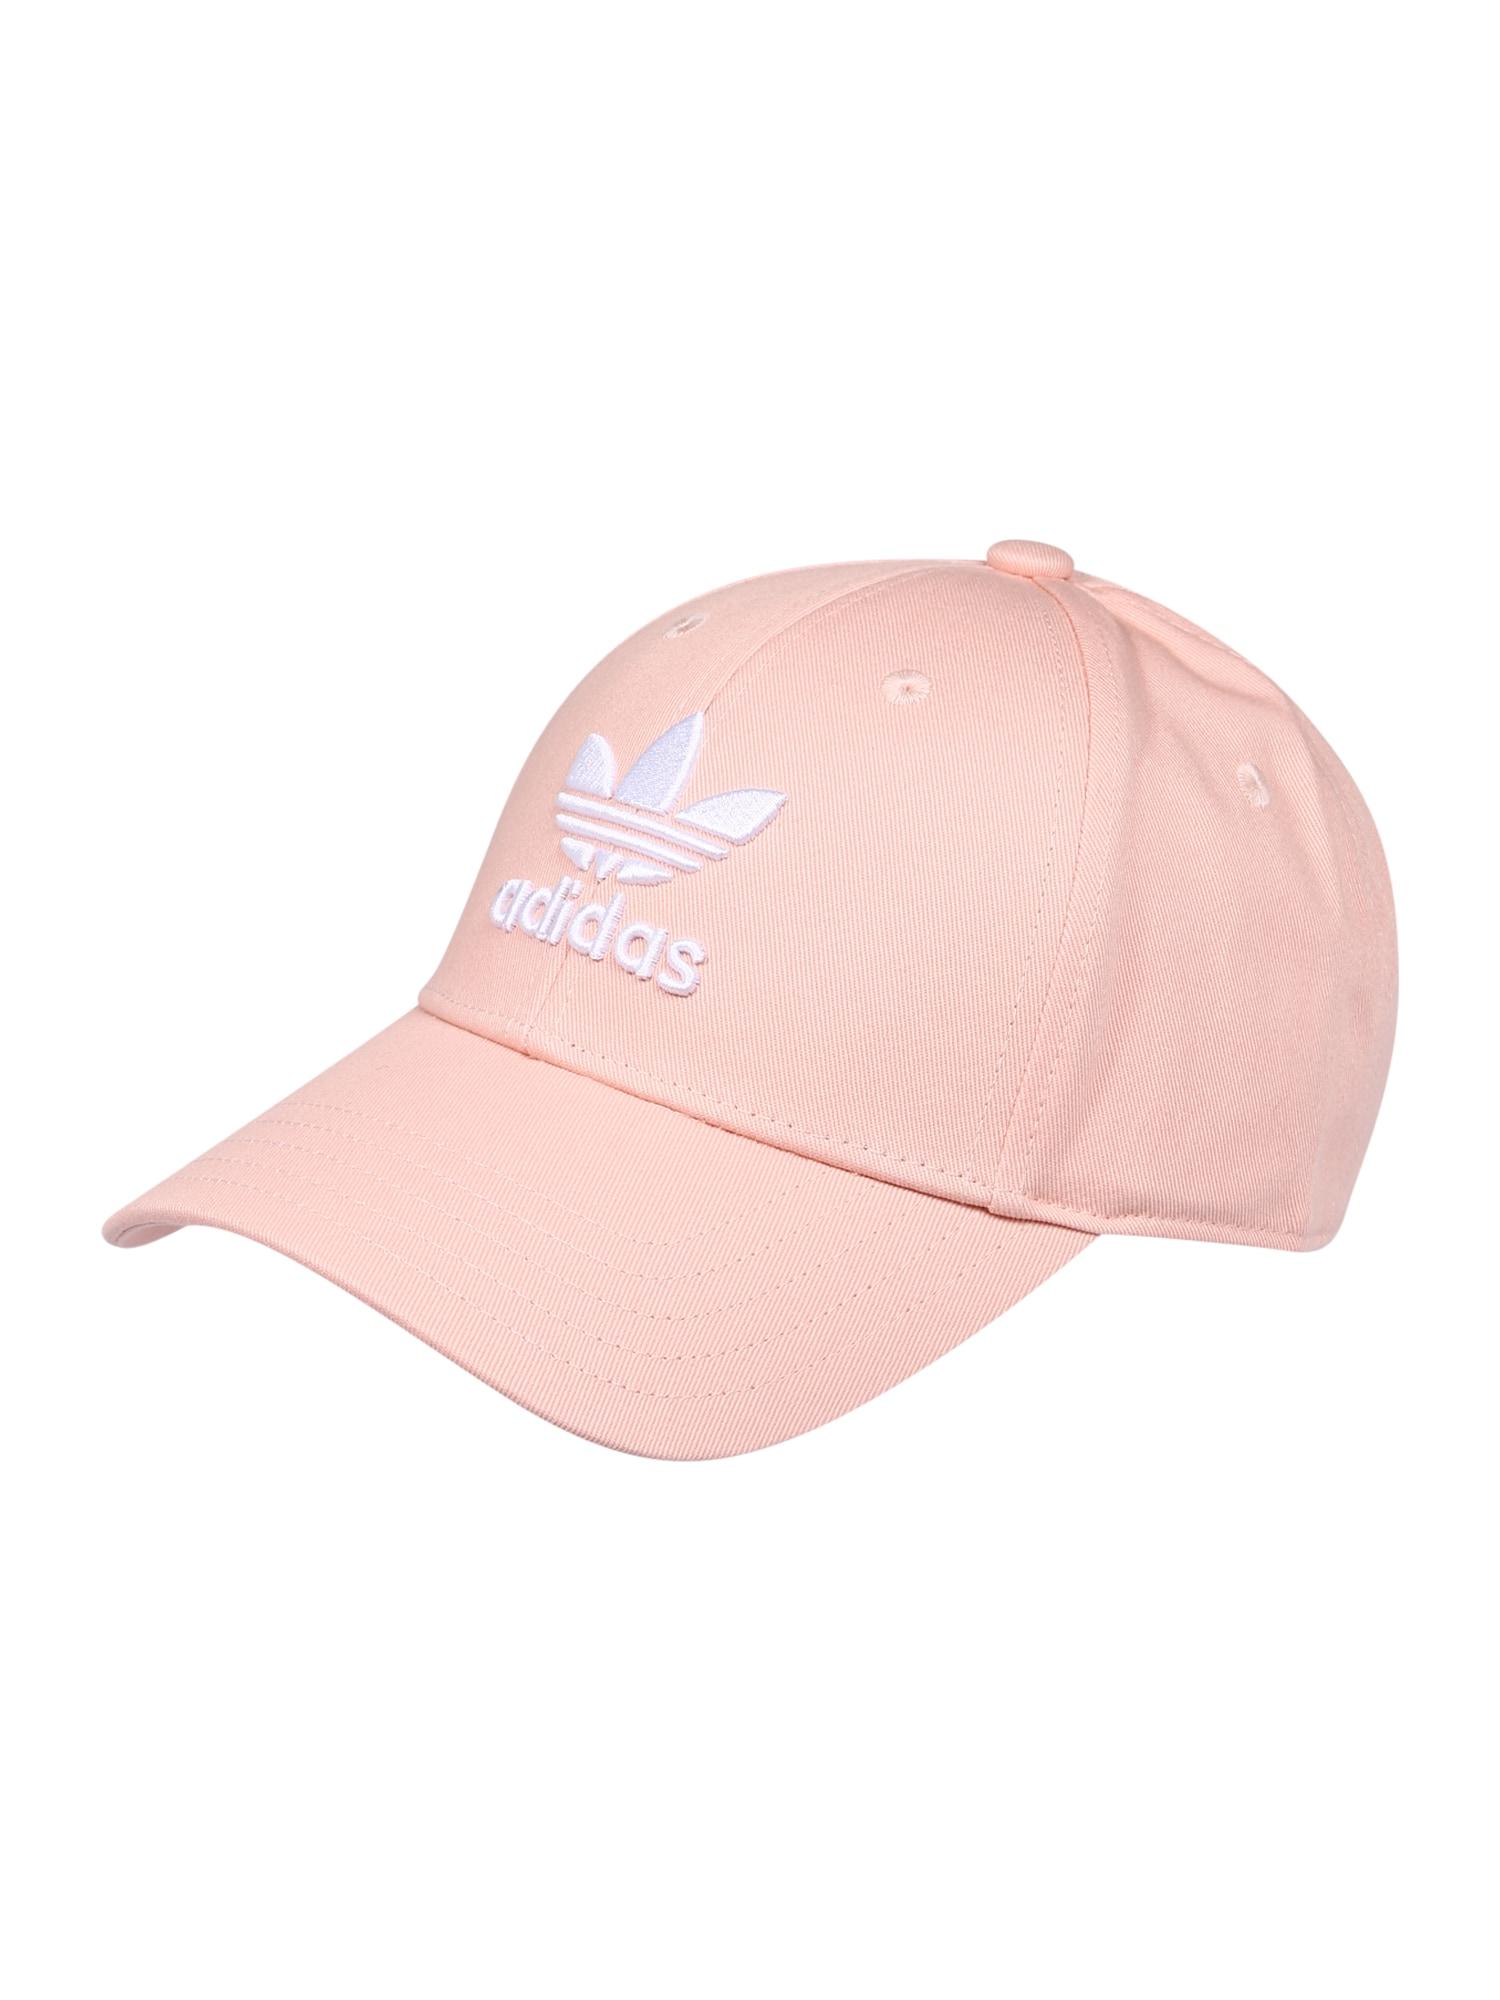 ADIDAS ORIGINALS Kepurė rožių spalva / balta